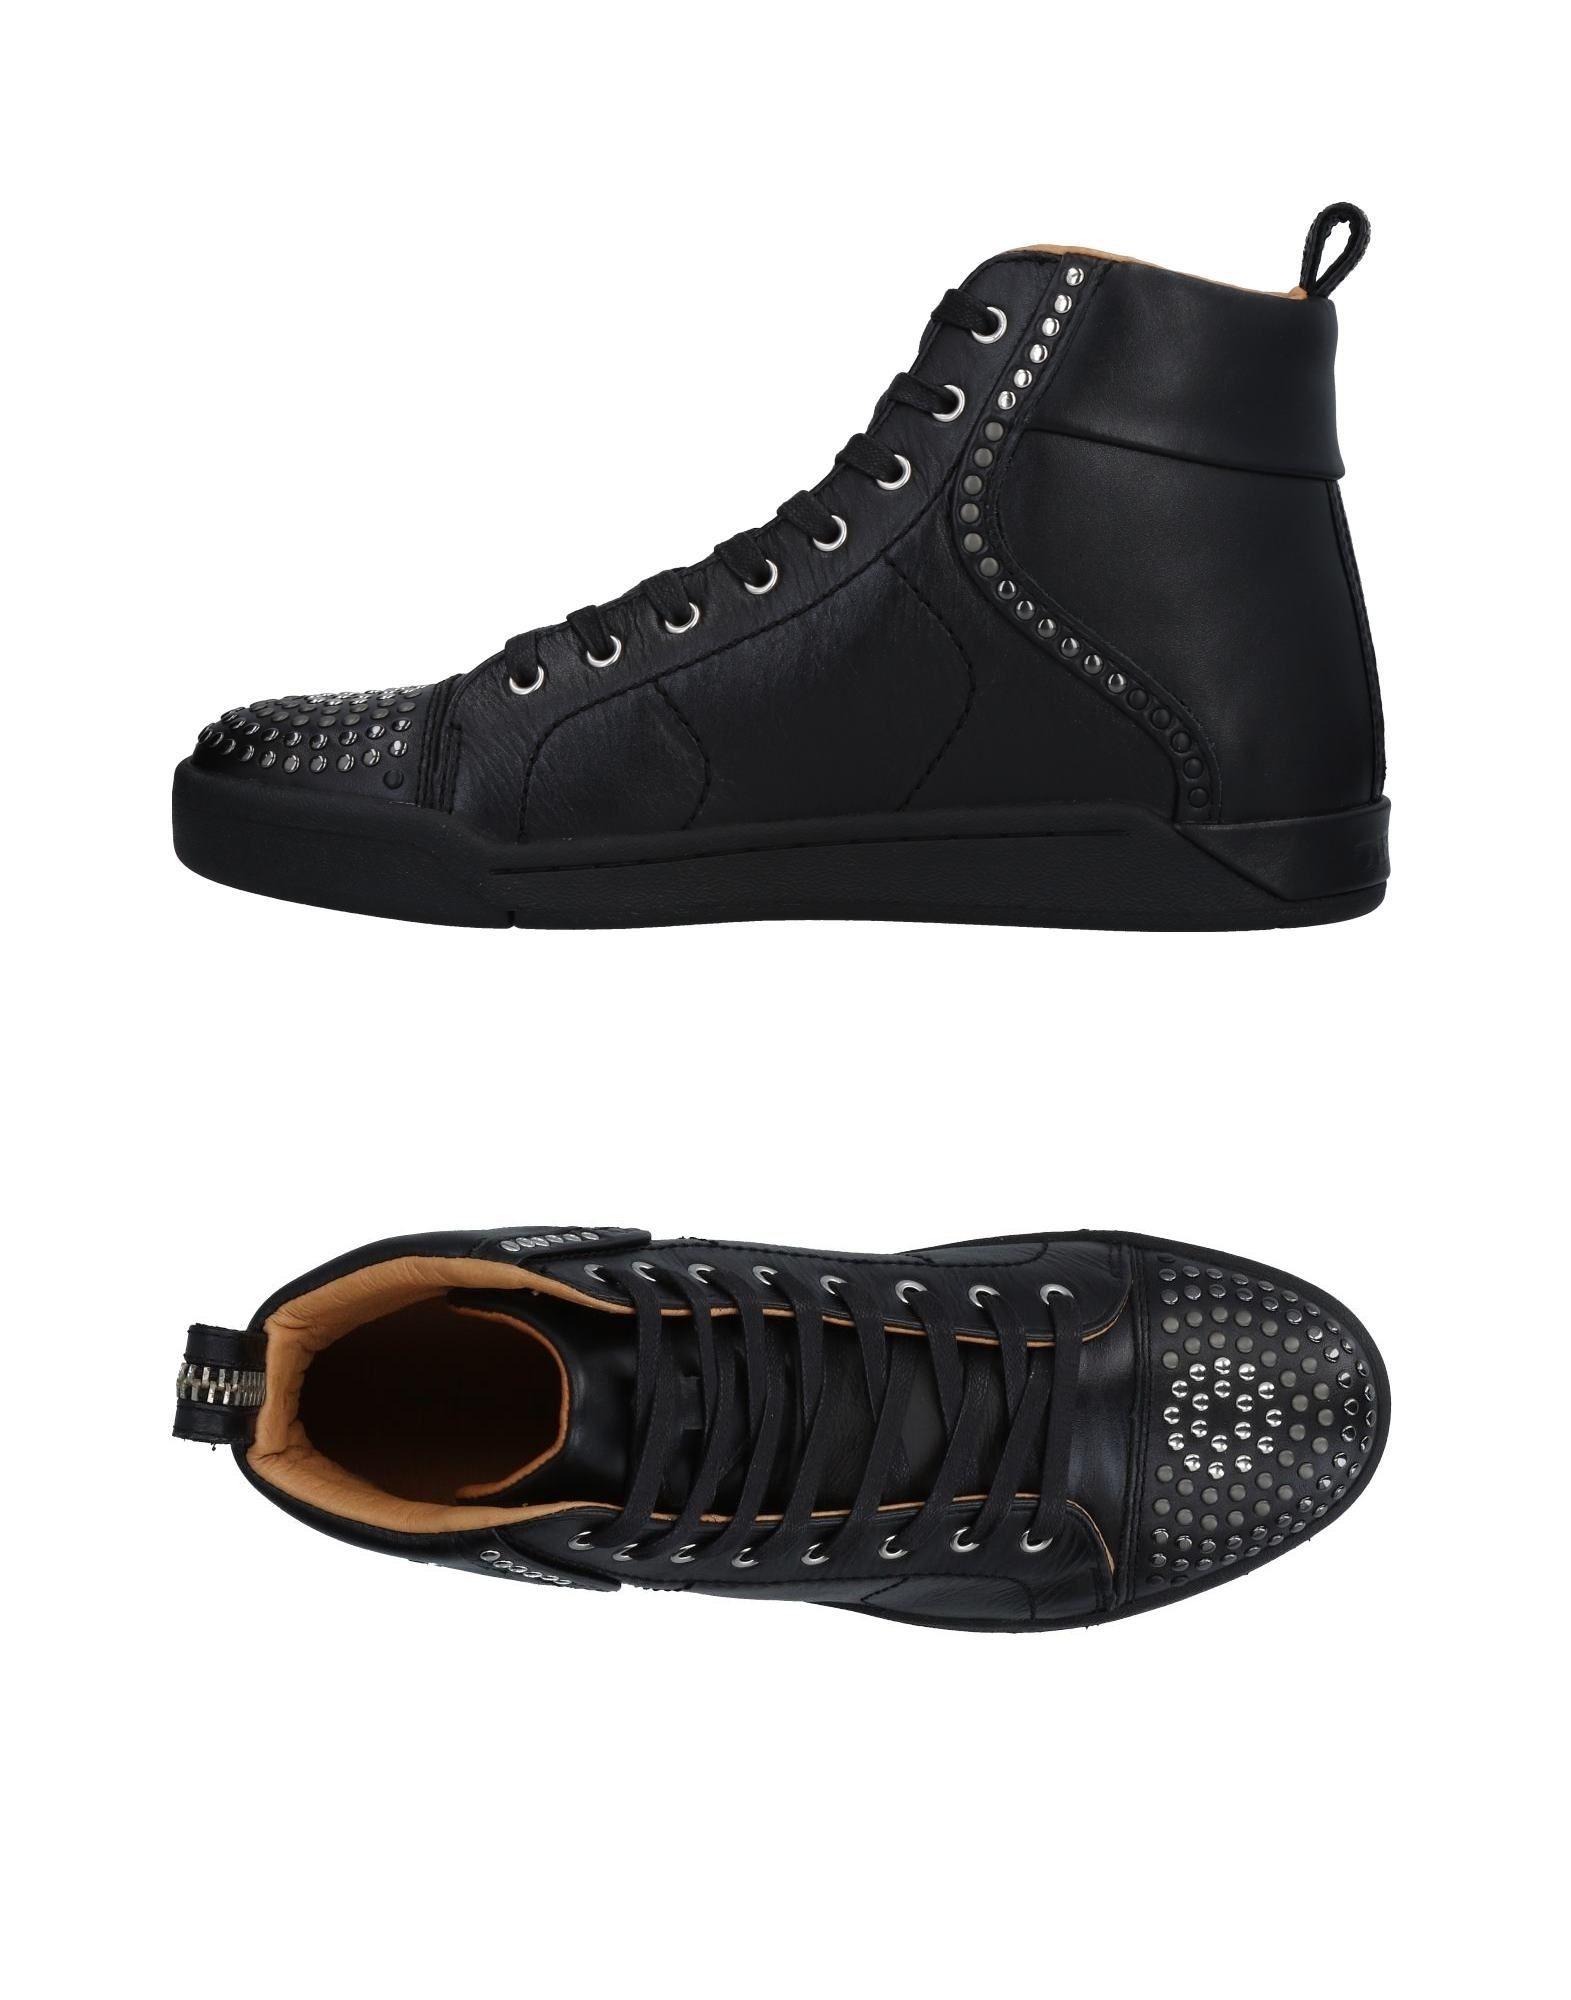 Moda Sneakers Diesel Uomo - 11476653EL